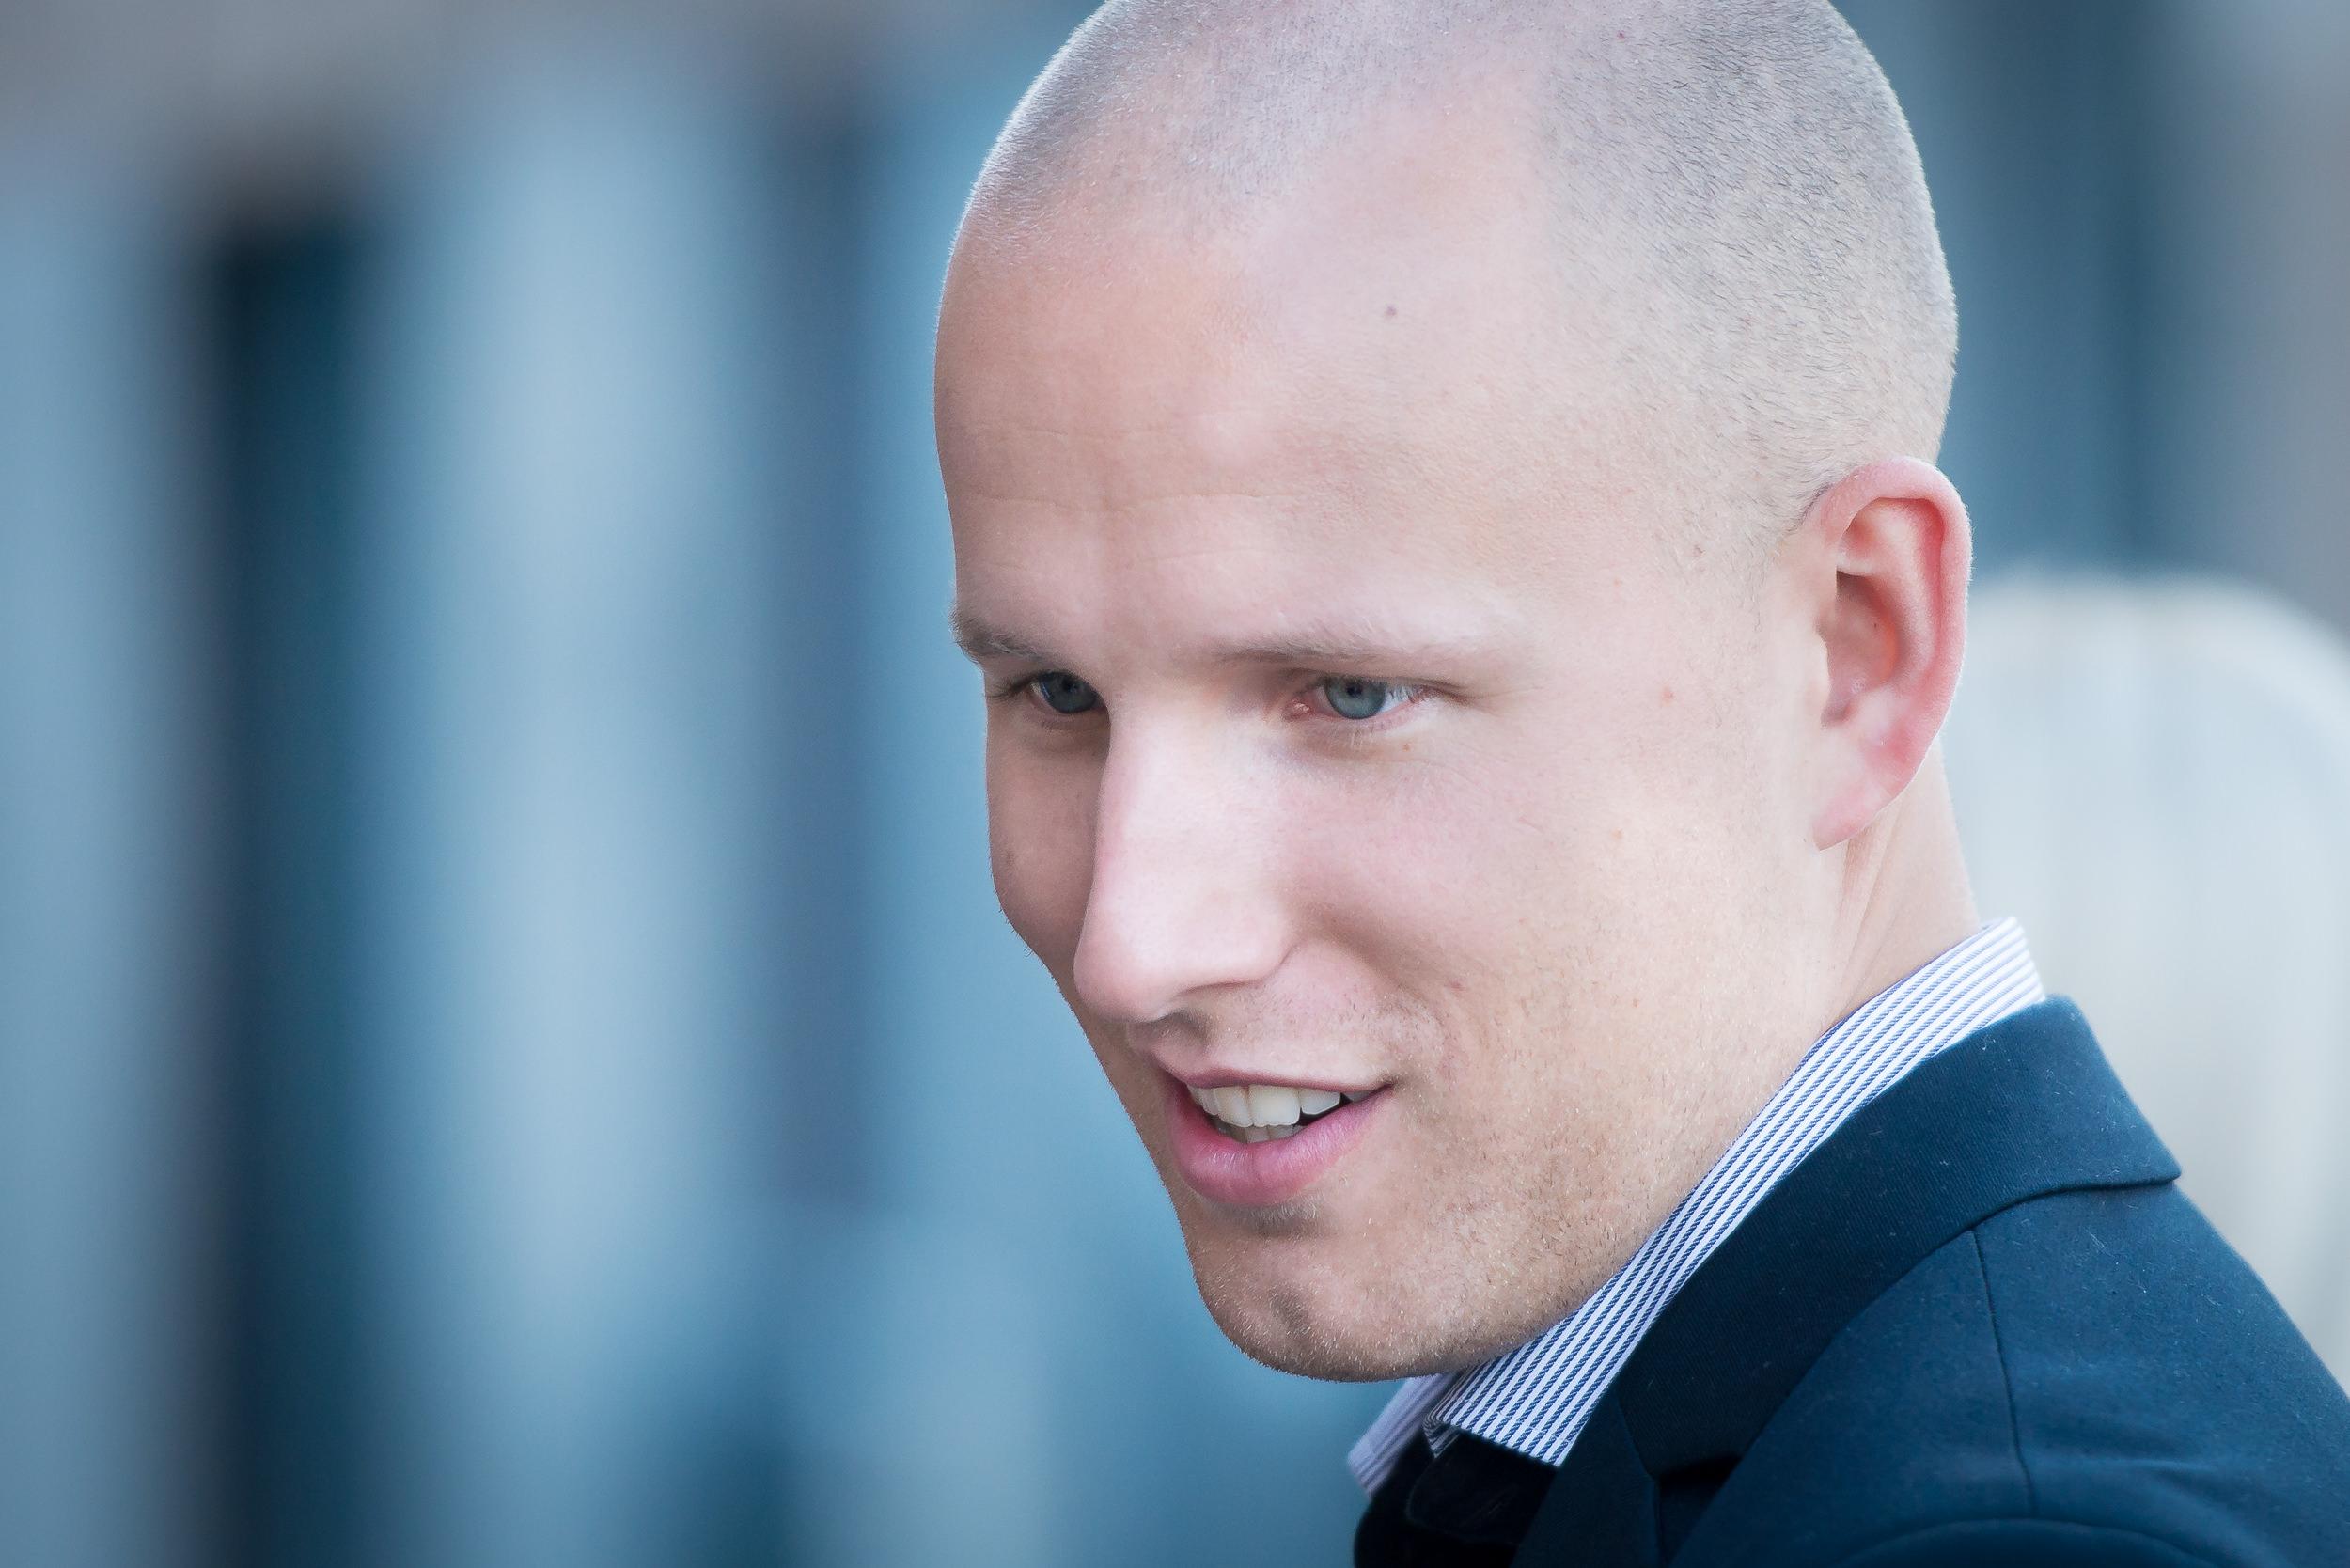 Företagsfoto - Headshot